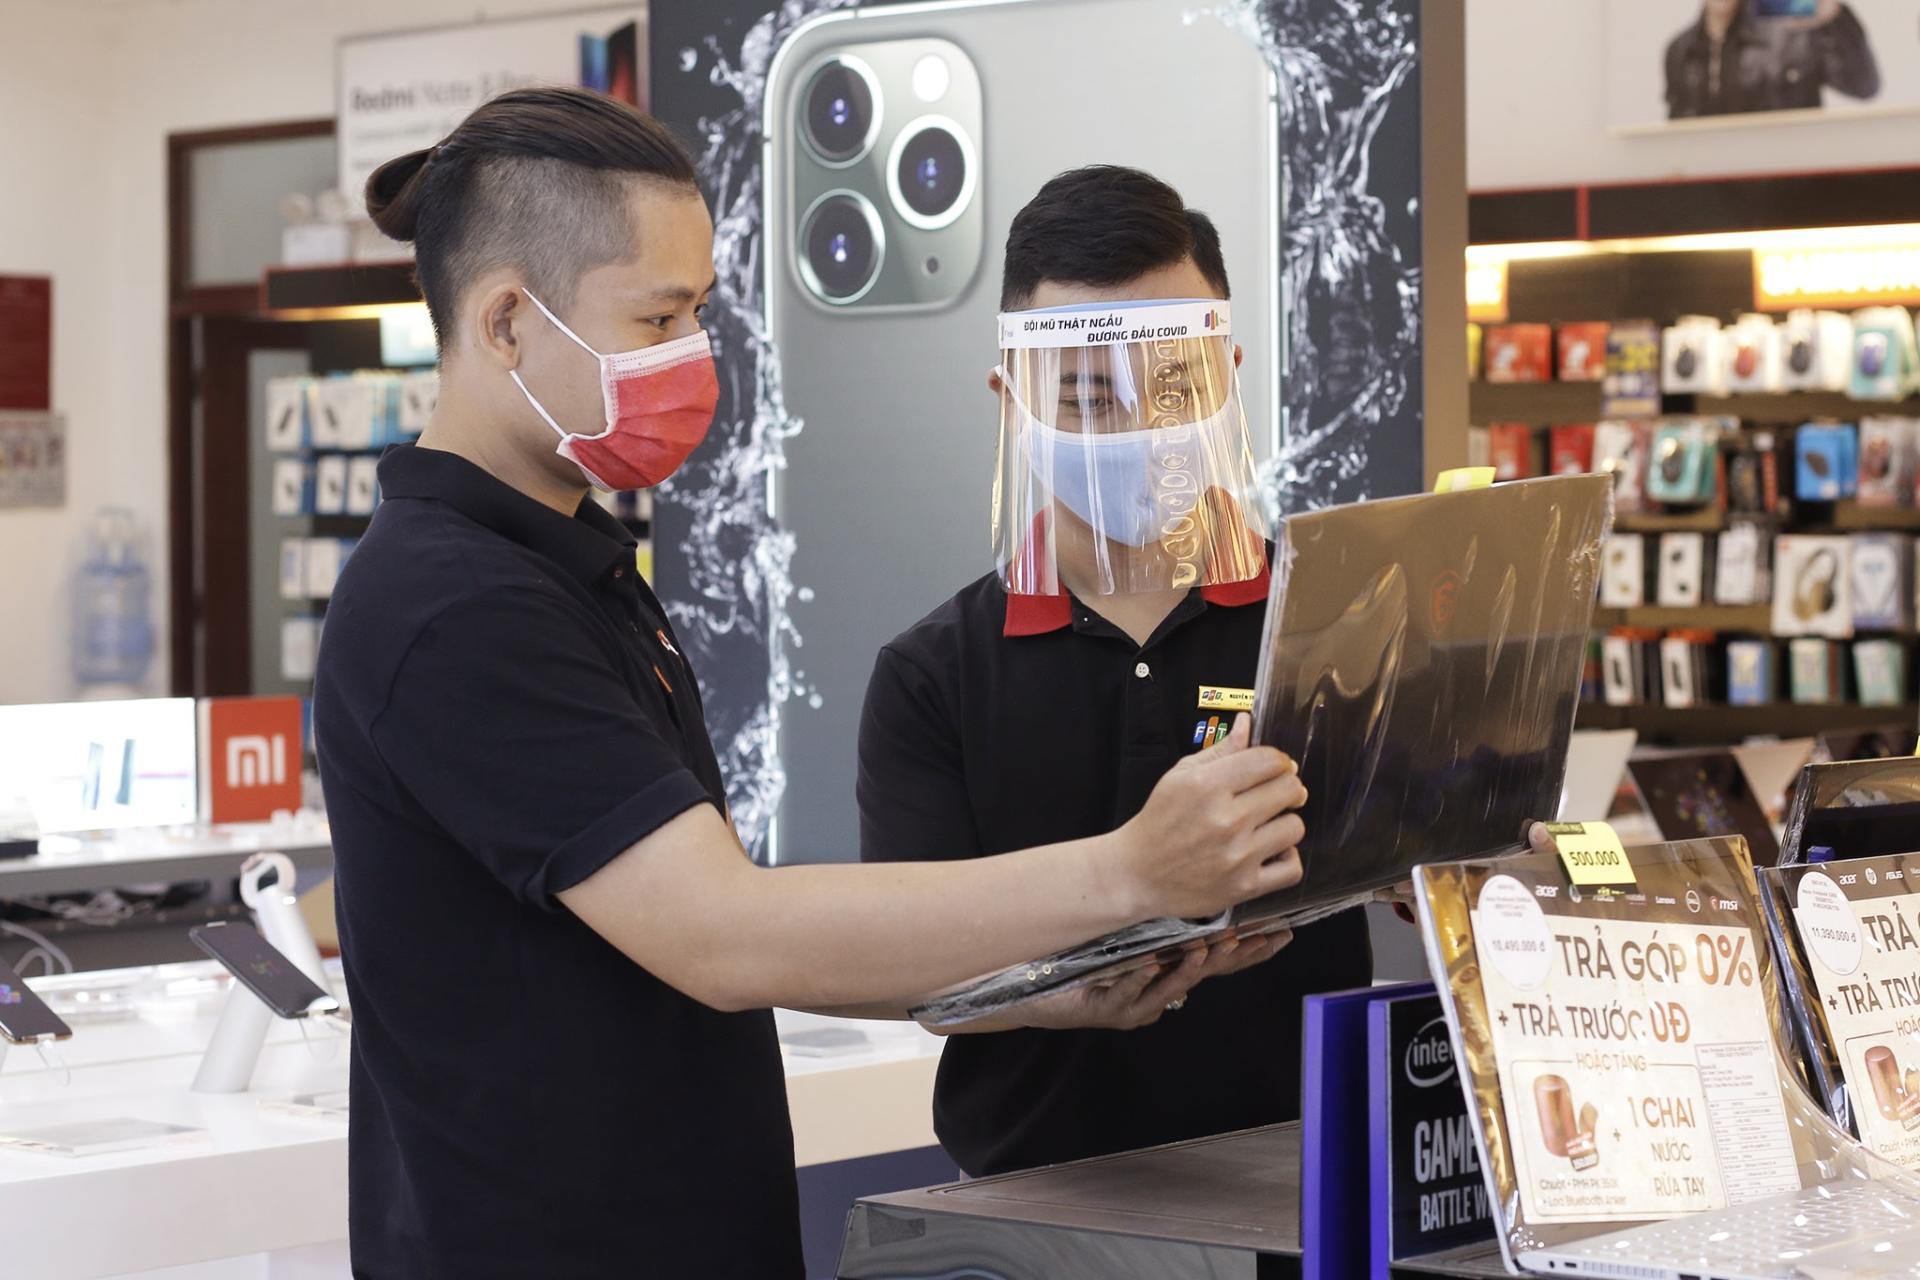 FPT Shop giảm 3 triệu, tặng combo làm việc tại nhà khi mua laptop